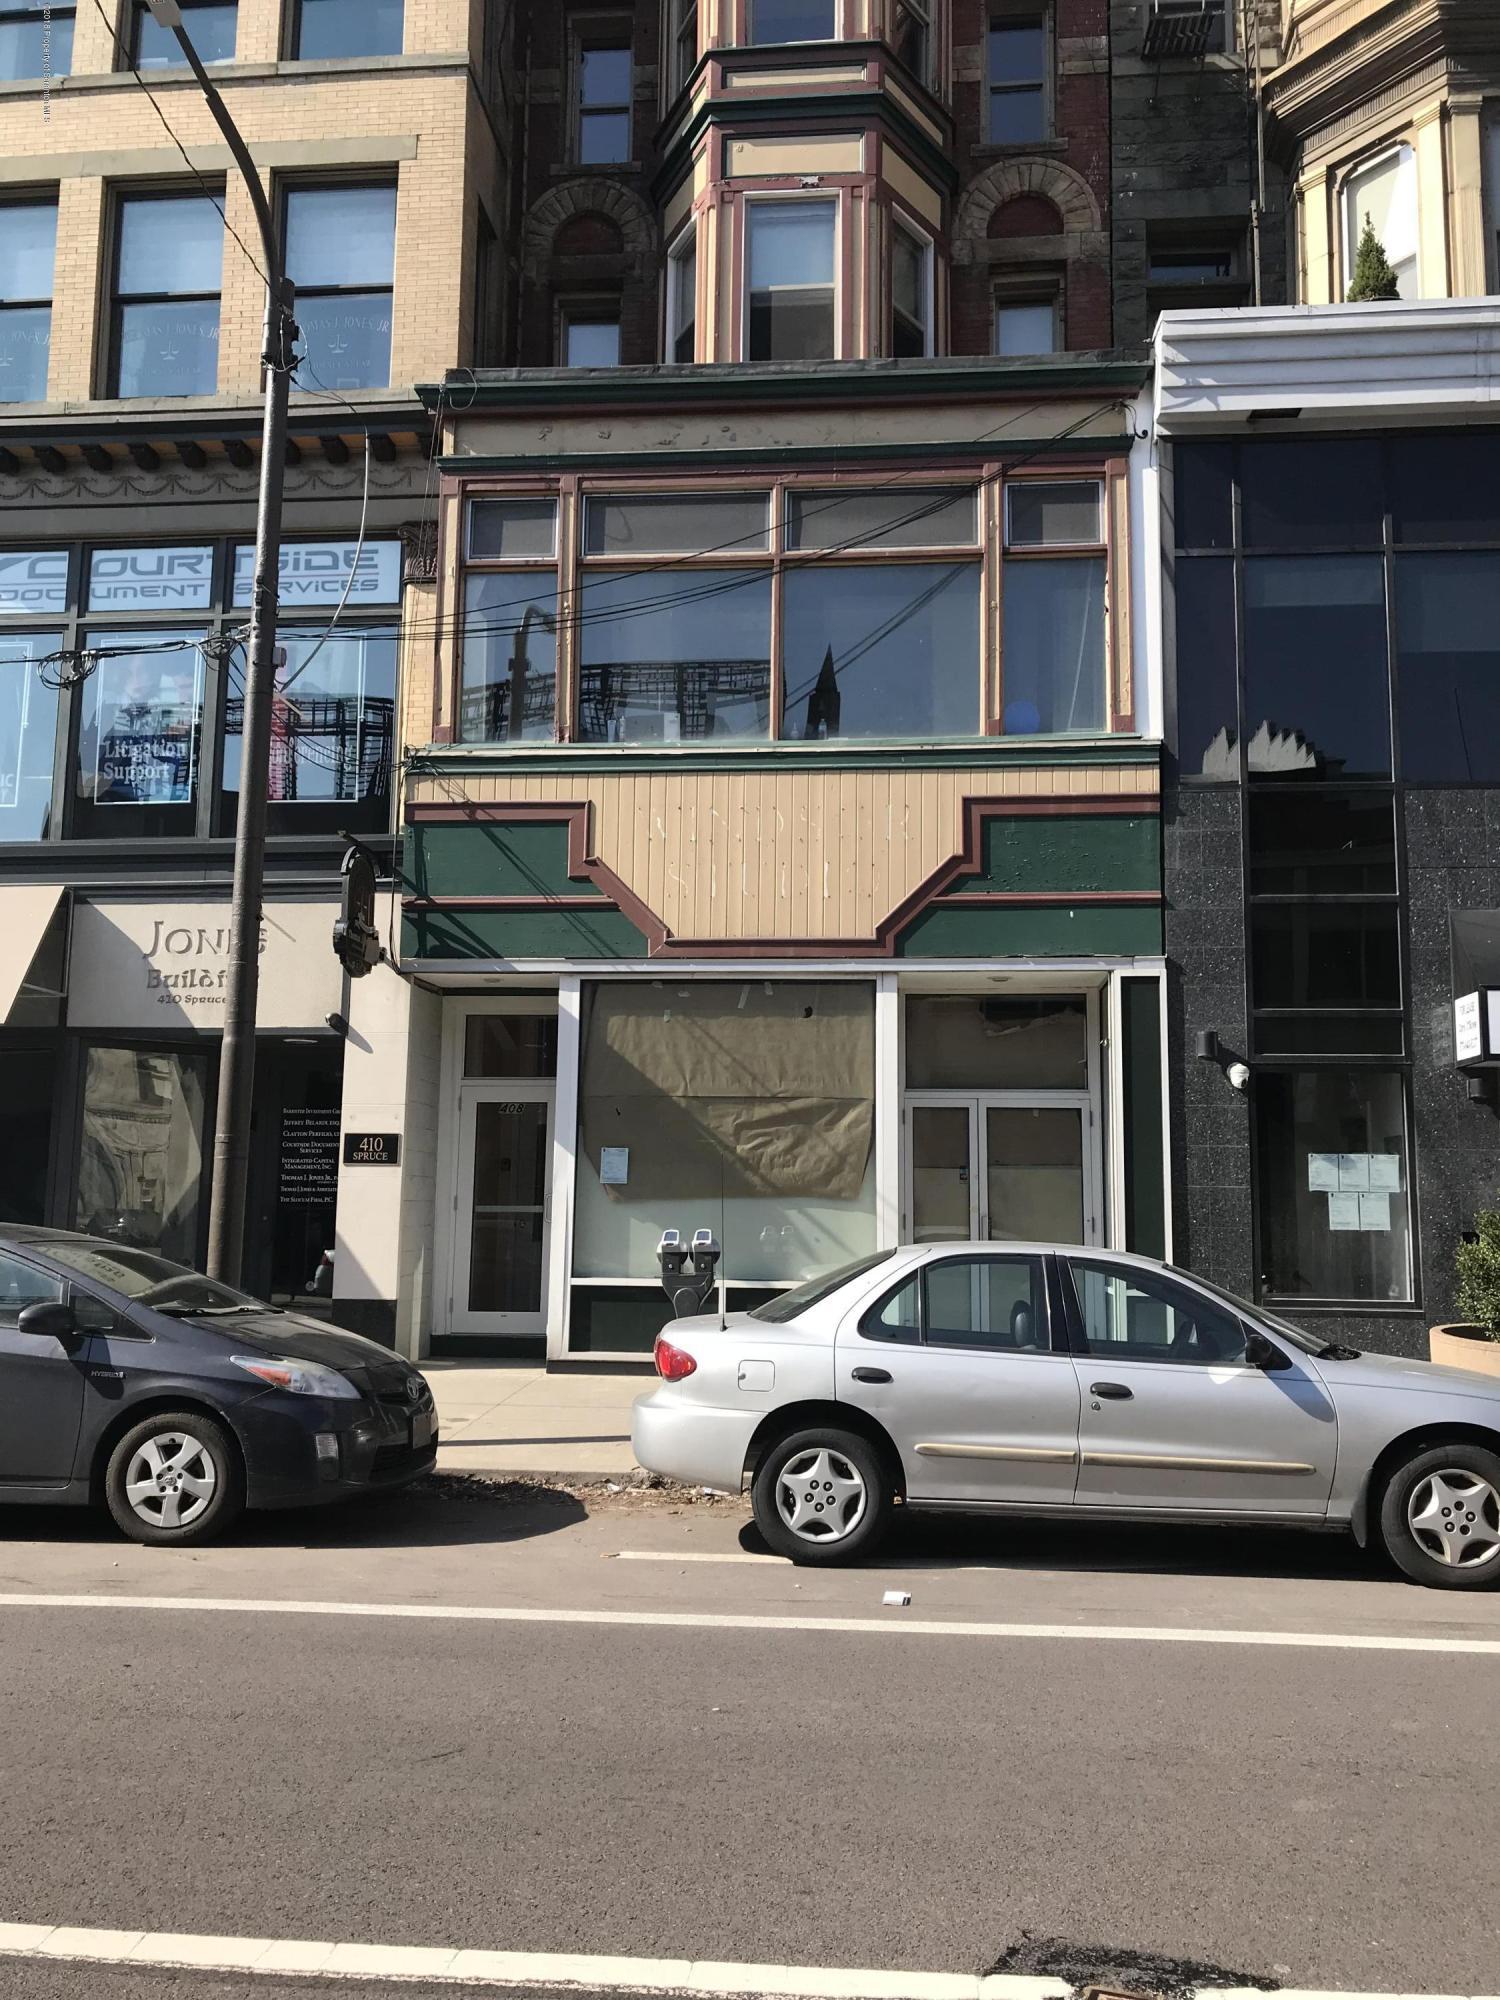 408 Spruce St, Scranton, Pennsylvania 18503, ,1 BathroomBathrooms,Commercial,For Lease,Spruce,18-1455